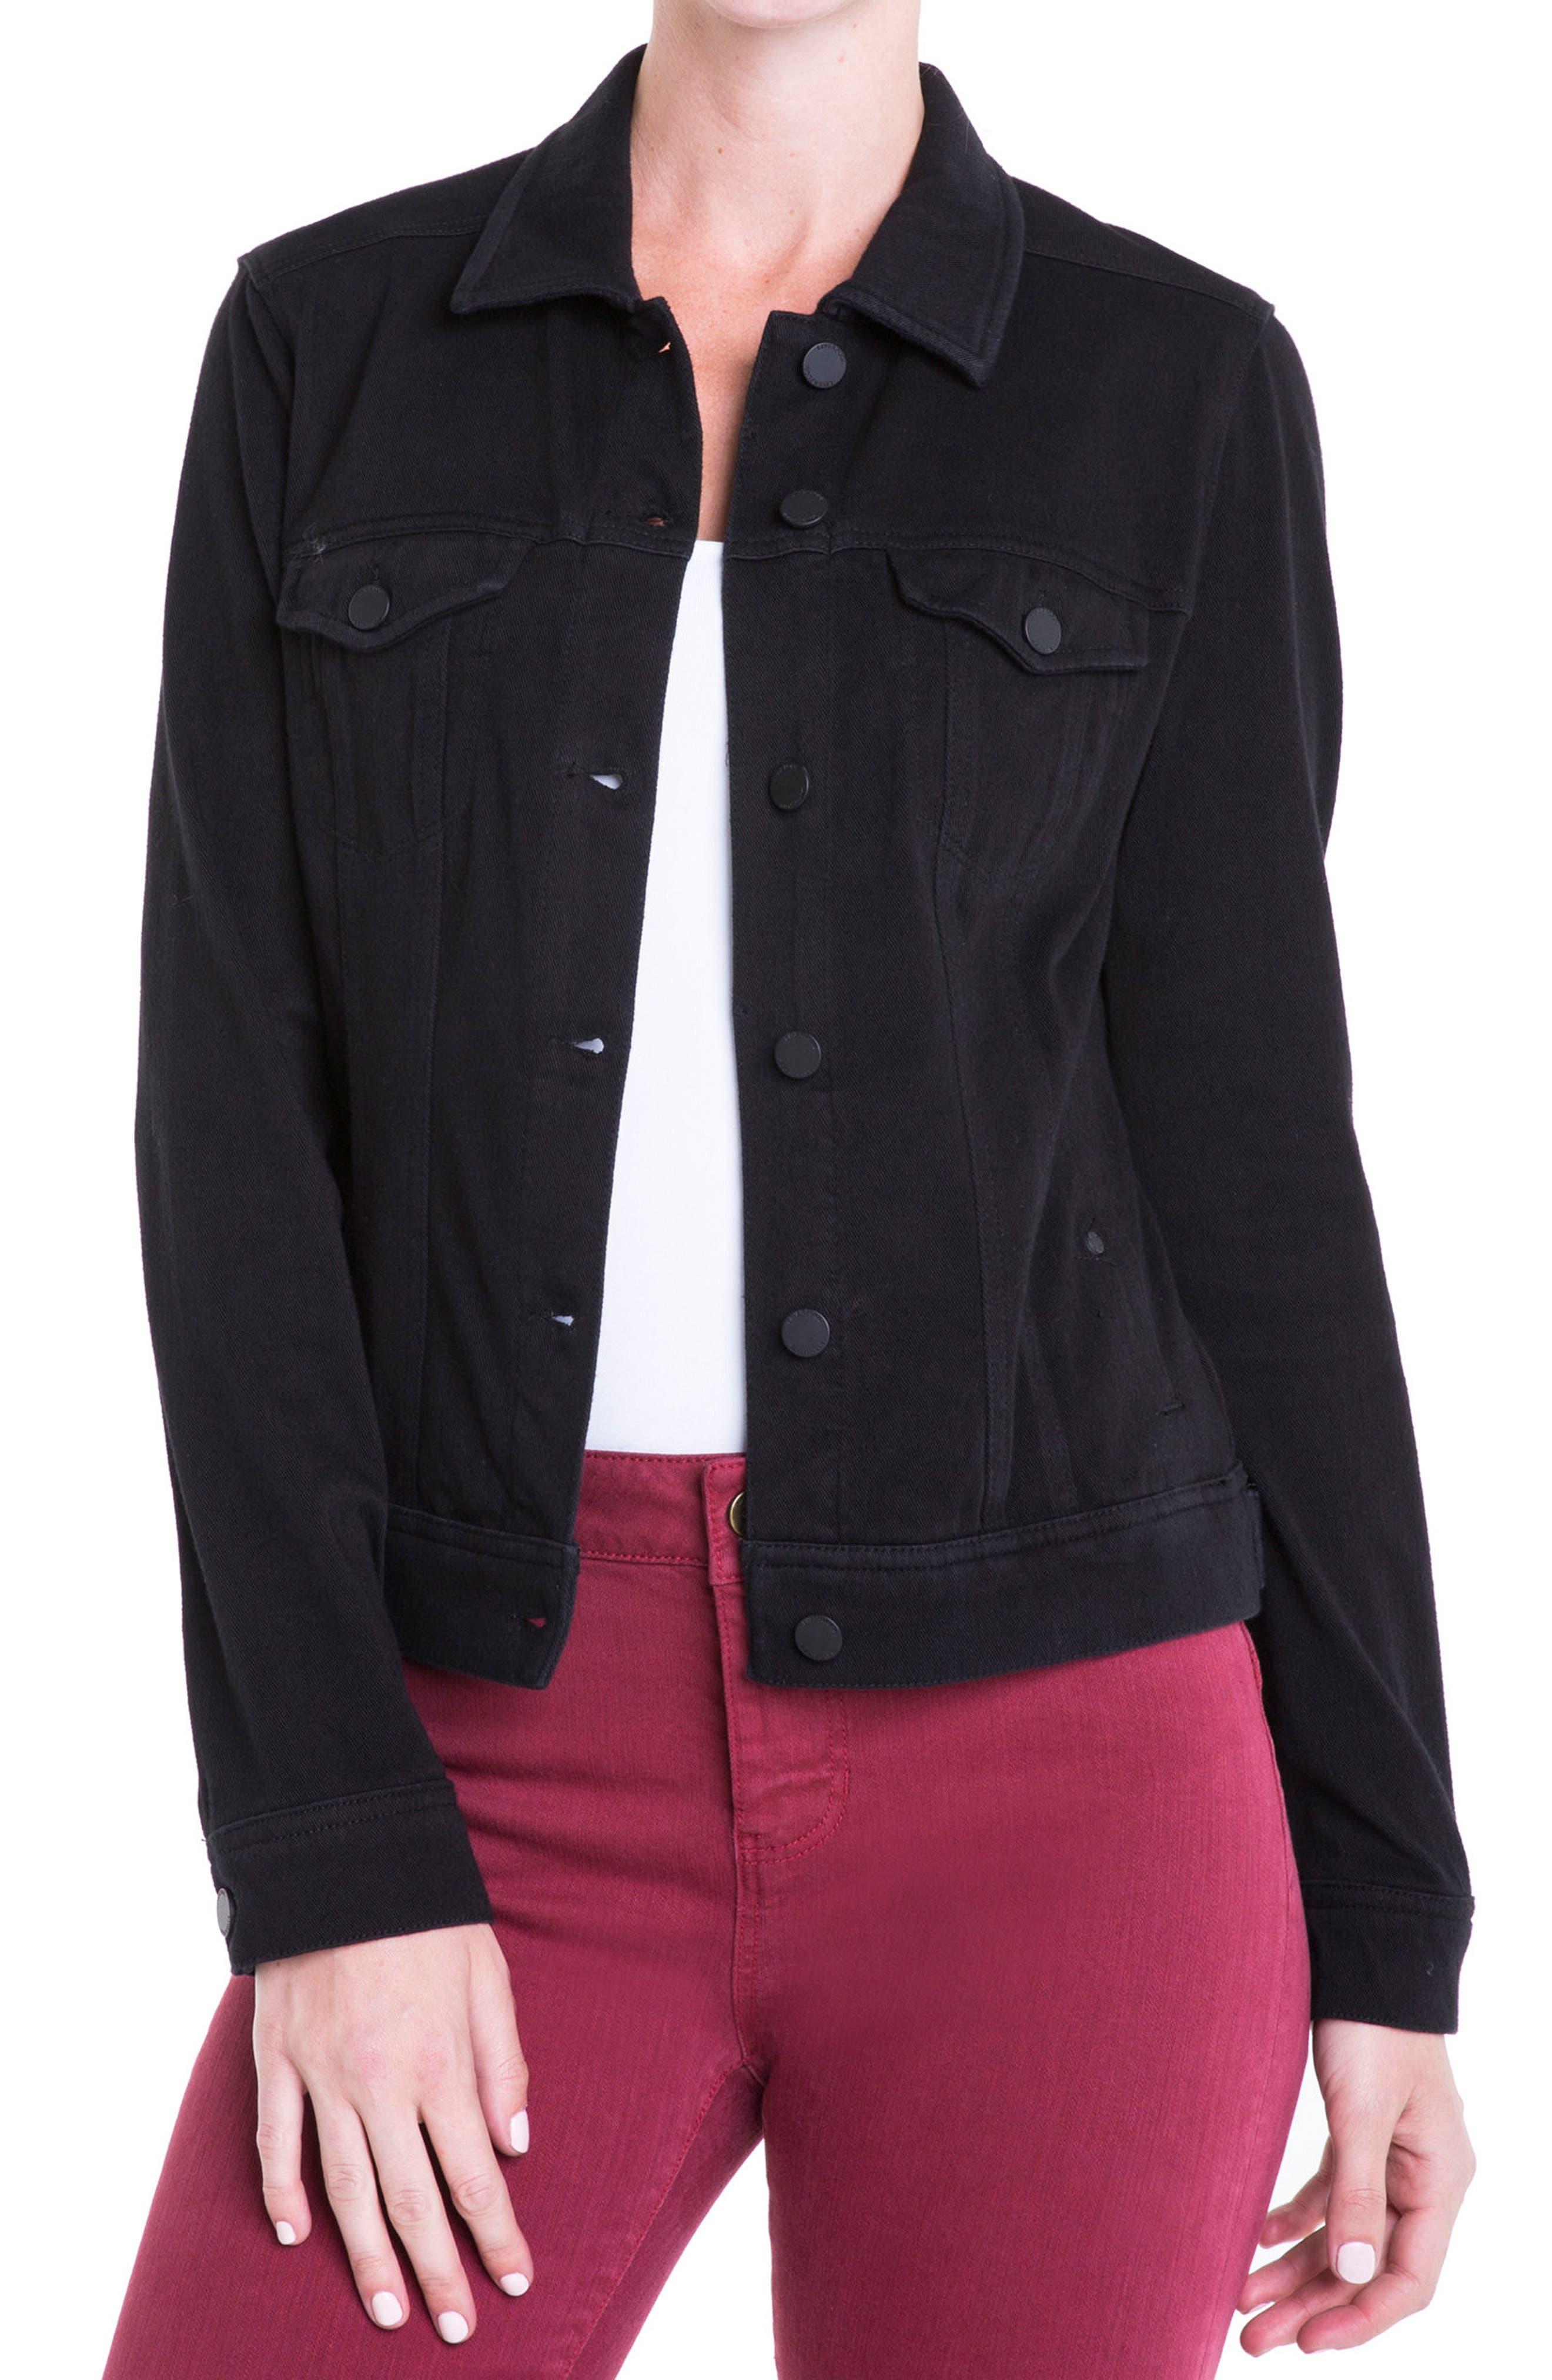 Main Image - Liverpool Jeans Co. Knit Denim Jacket (Petite)